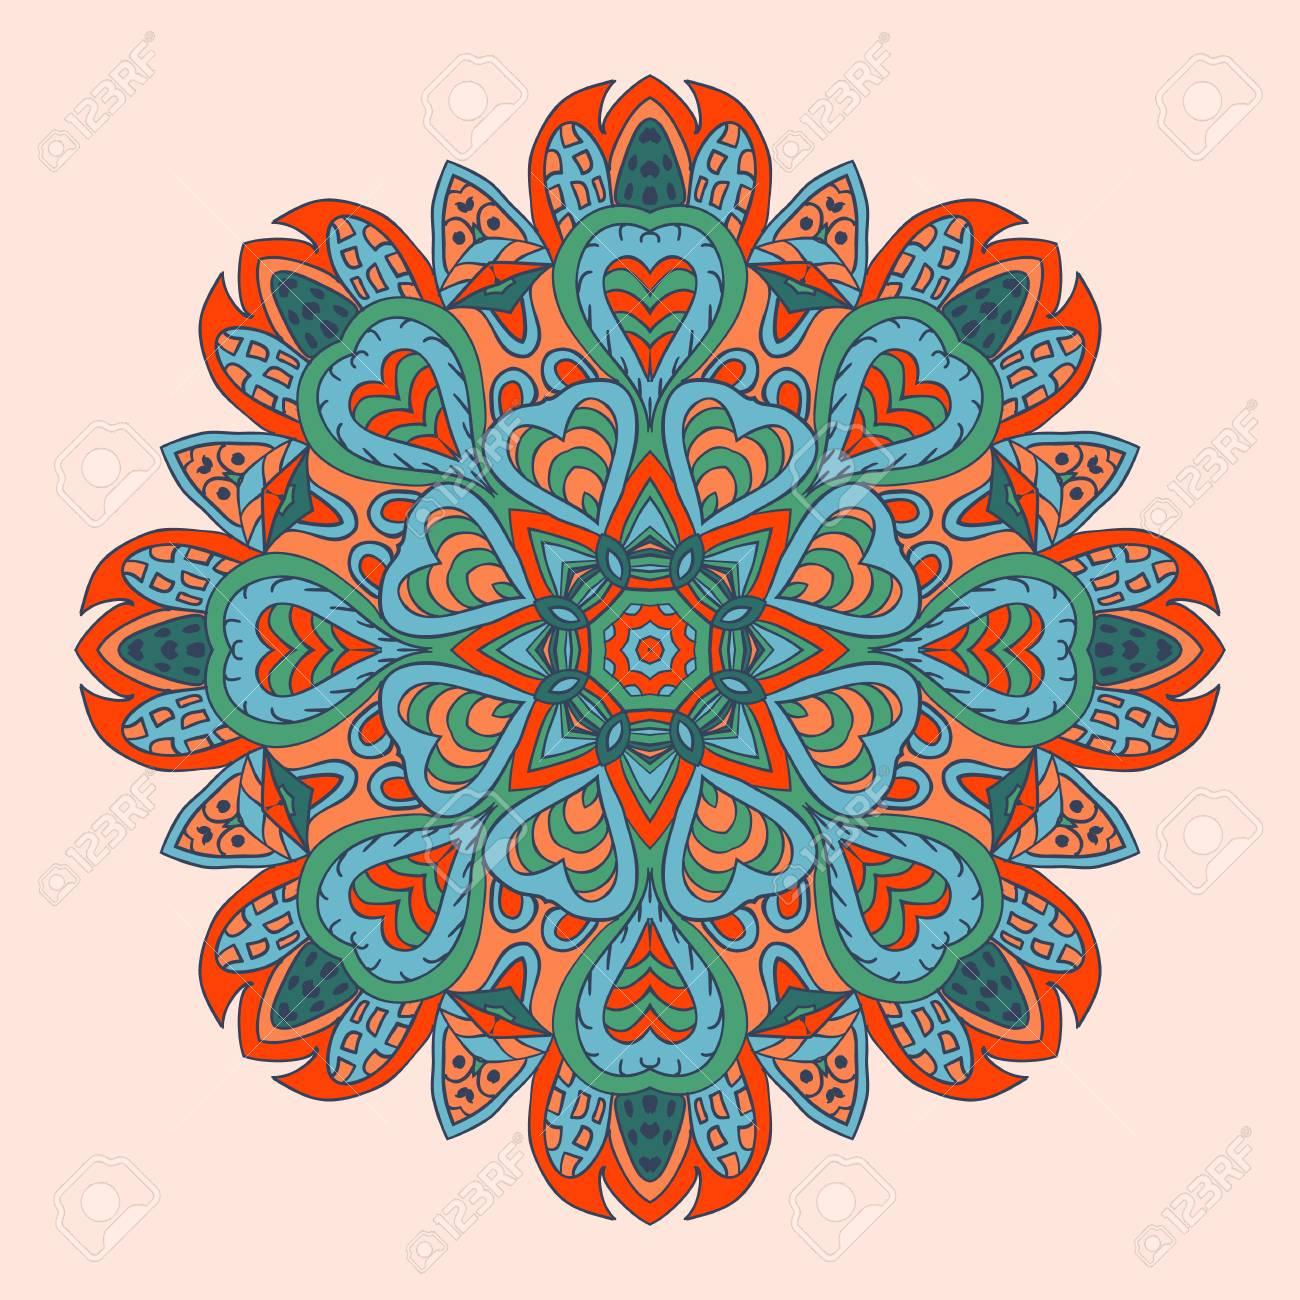 Mandala Doodle Dibujo Colorido Adorno Redondo Motivos étnicos